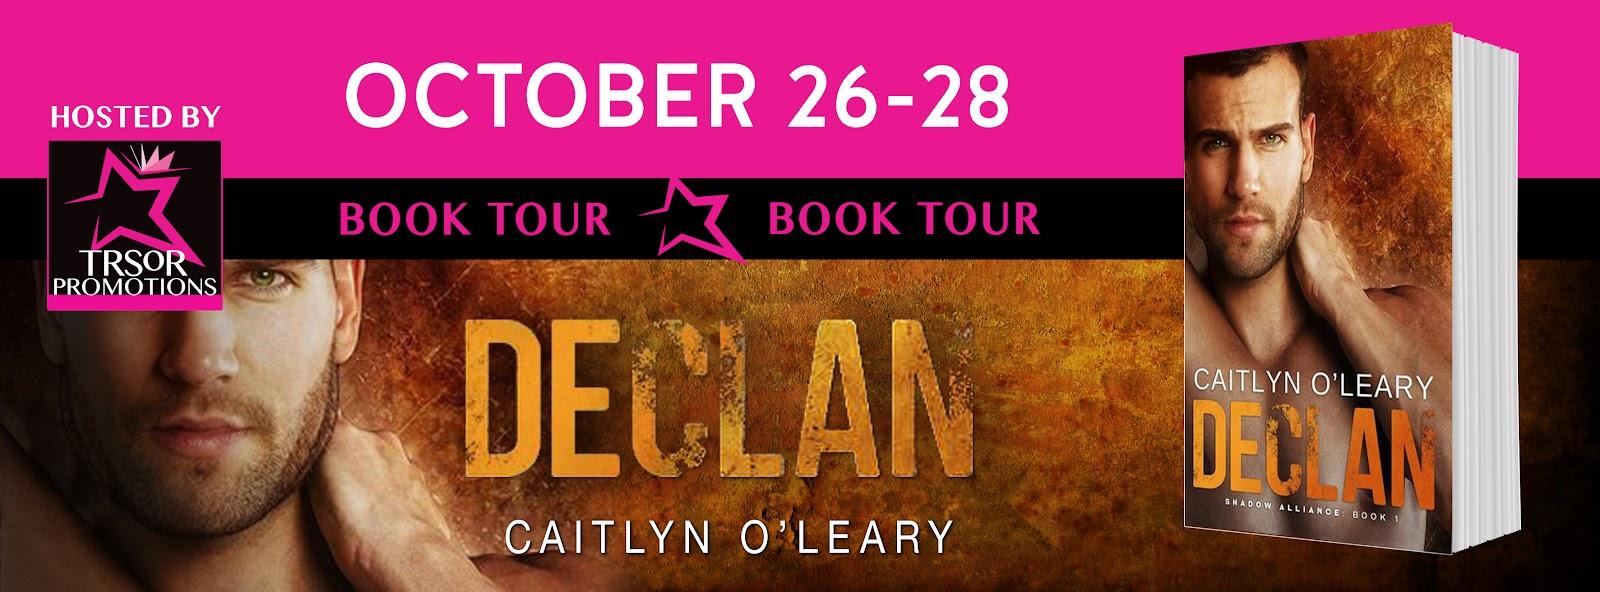 DECLAN_BOOK_TOUR.jpg